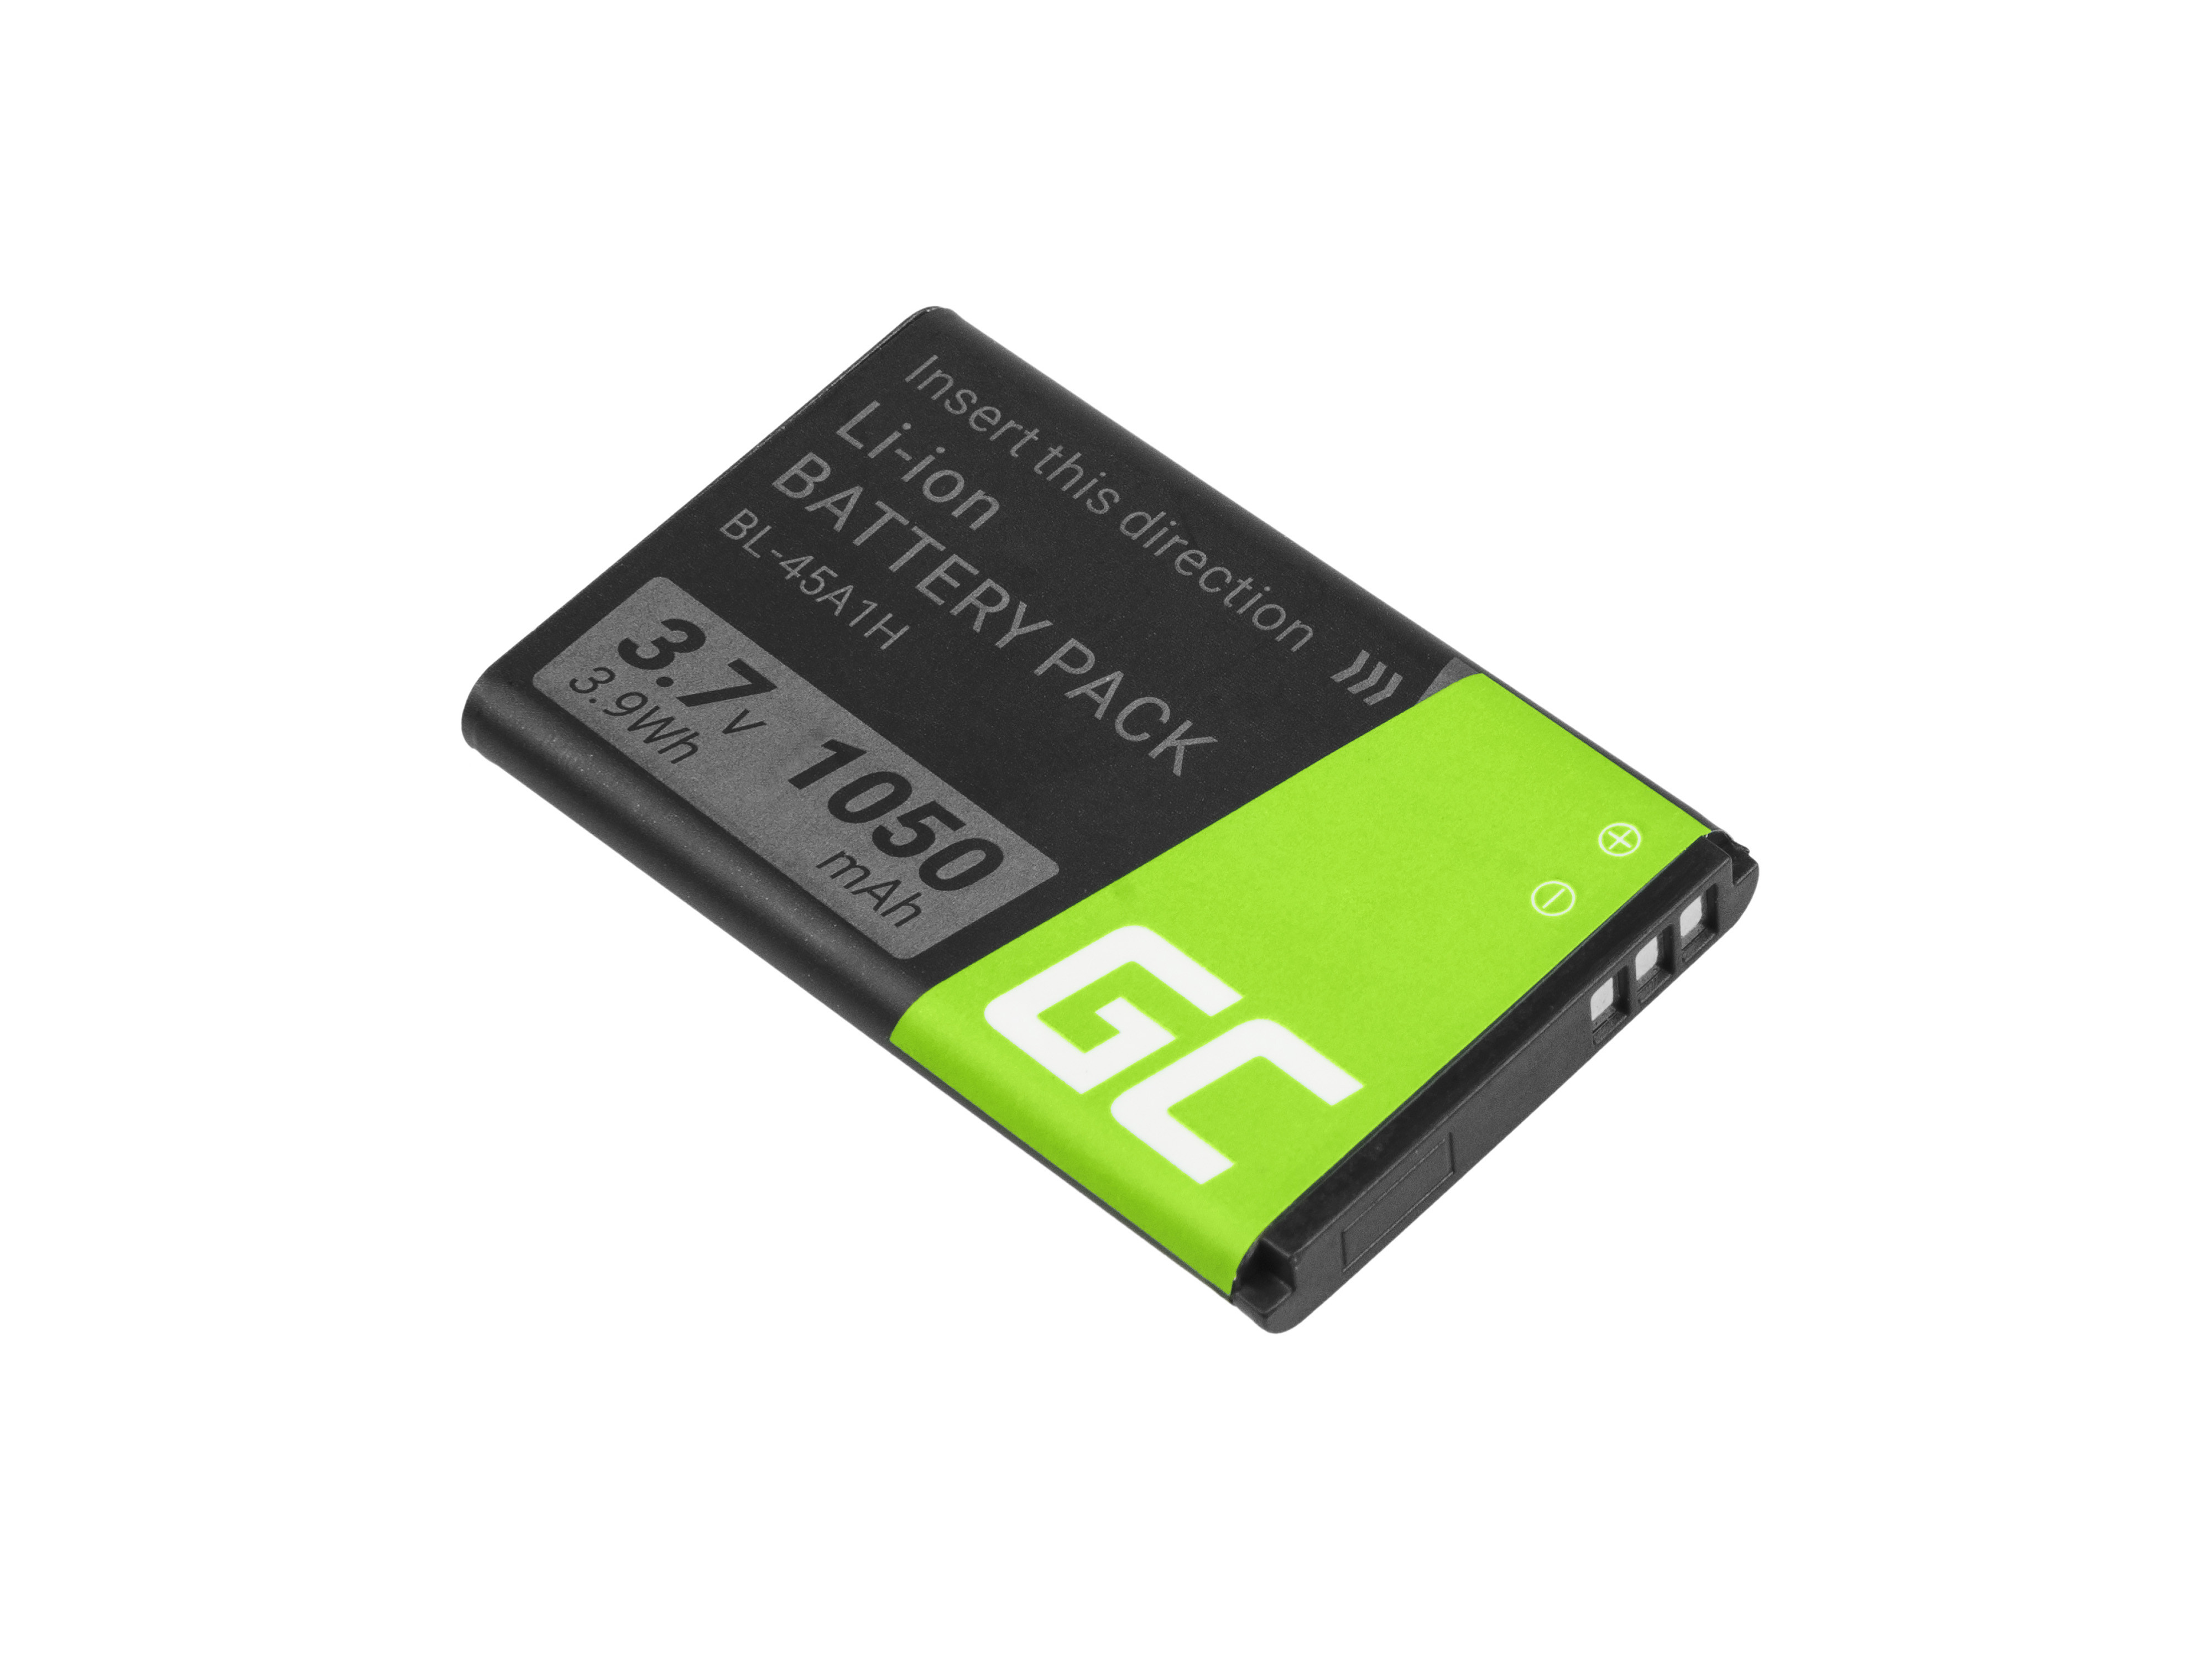 Baterie Green Cell BS-09 BS-16 myPhone Easy Flip Halo 1050mAh Li-ion - neoriginální